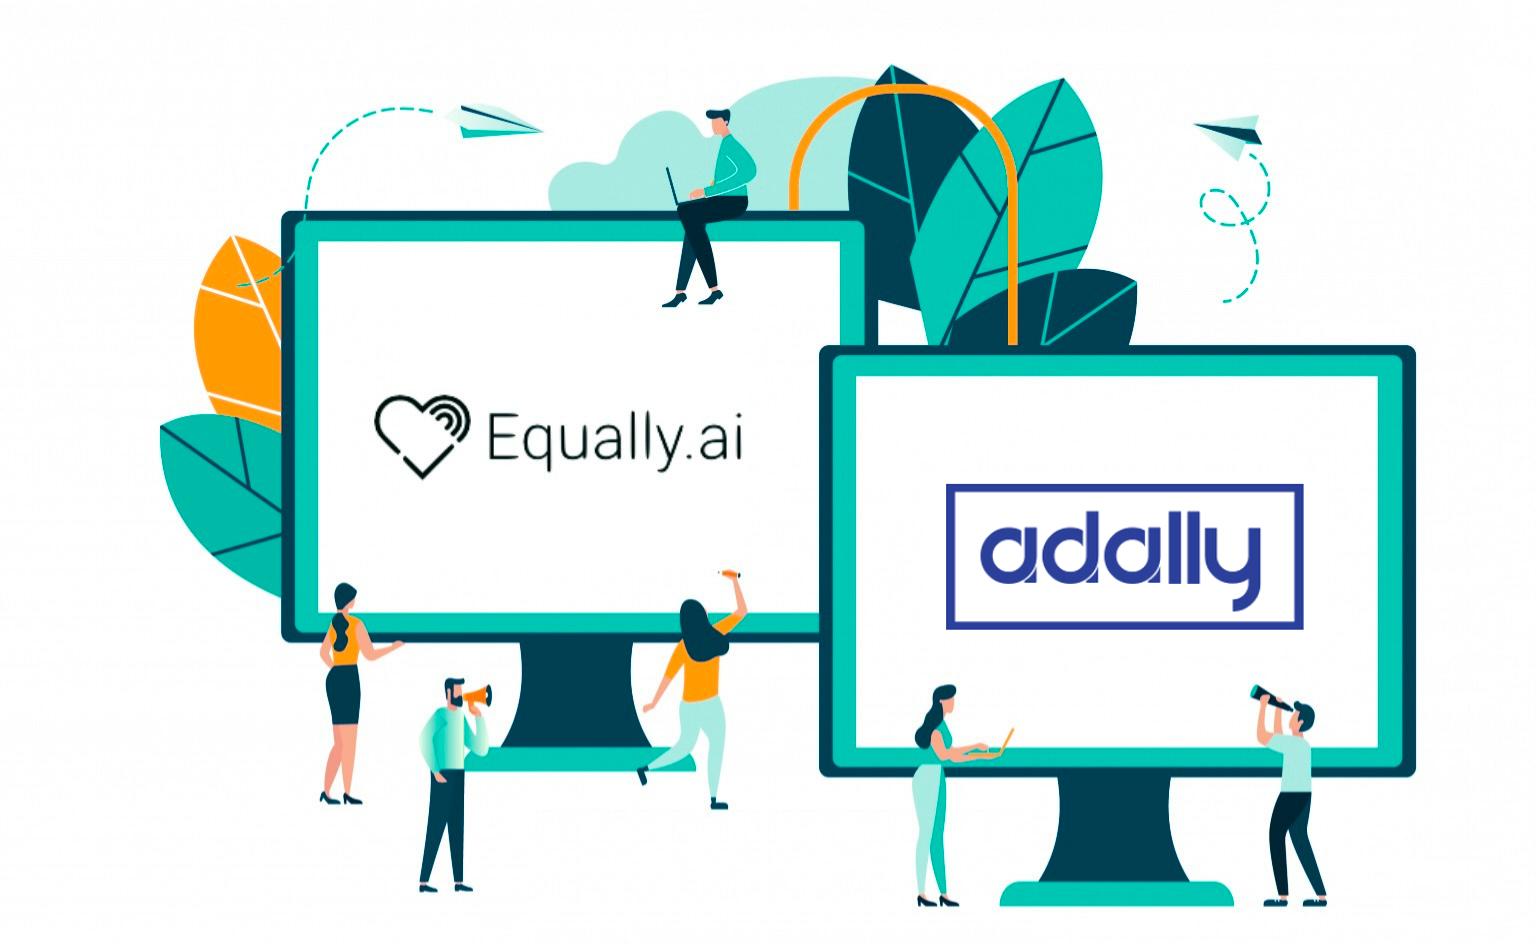 Equally contro Adally